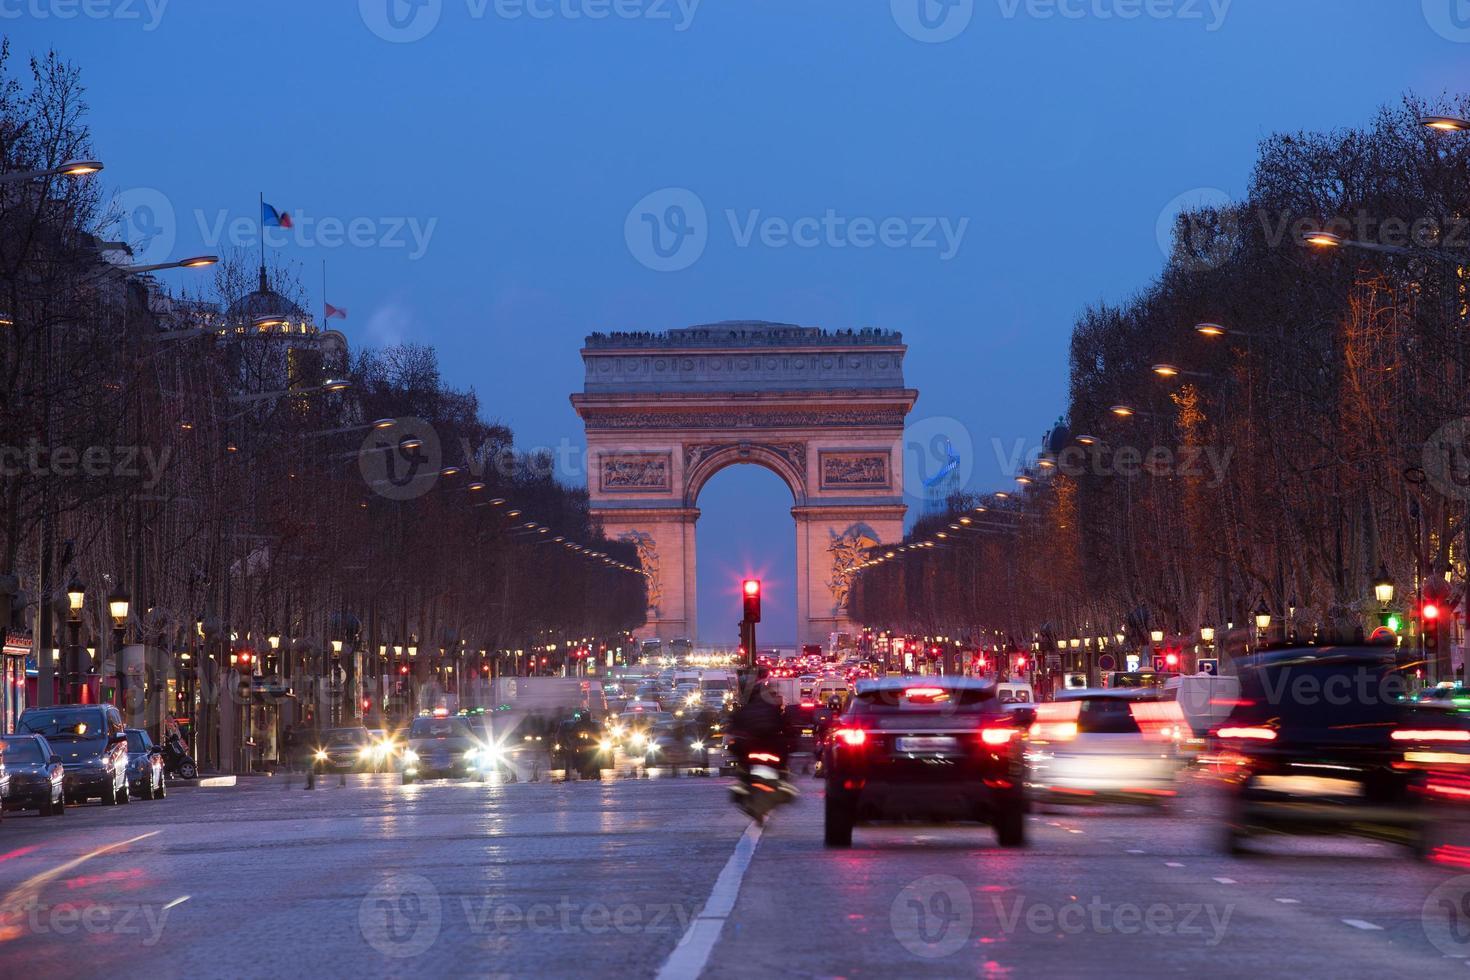 parijs, champs-elysees, arc de triomphe foto